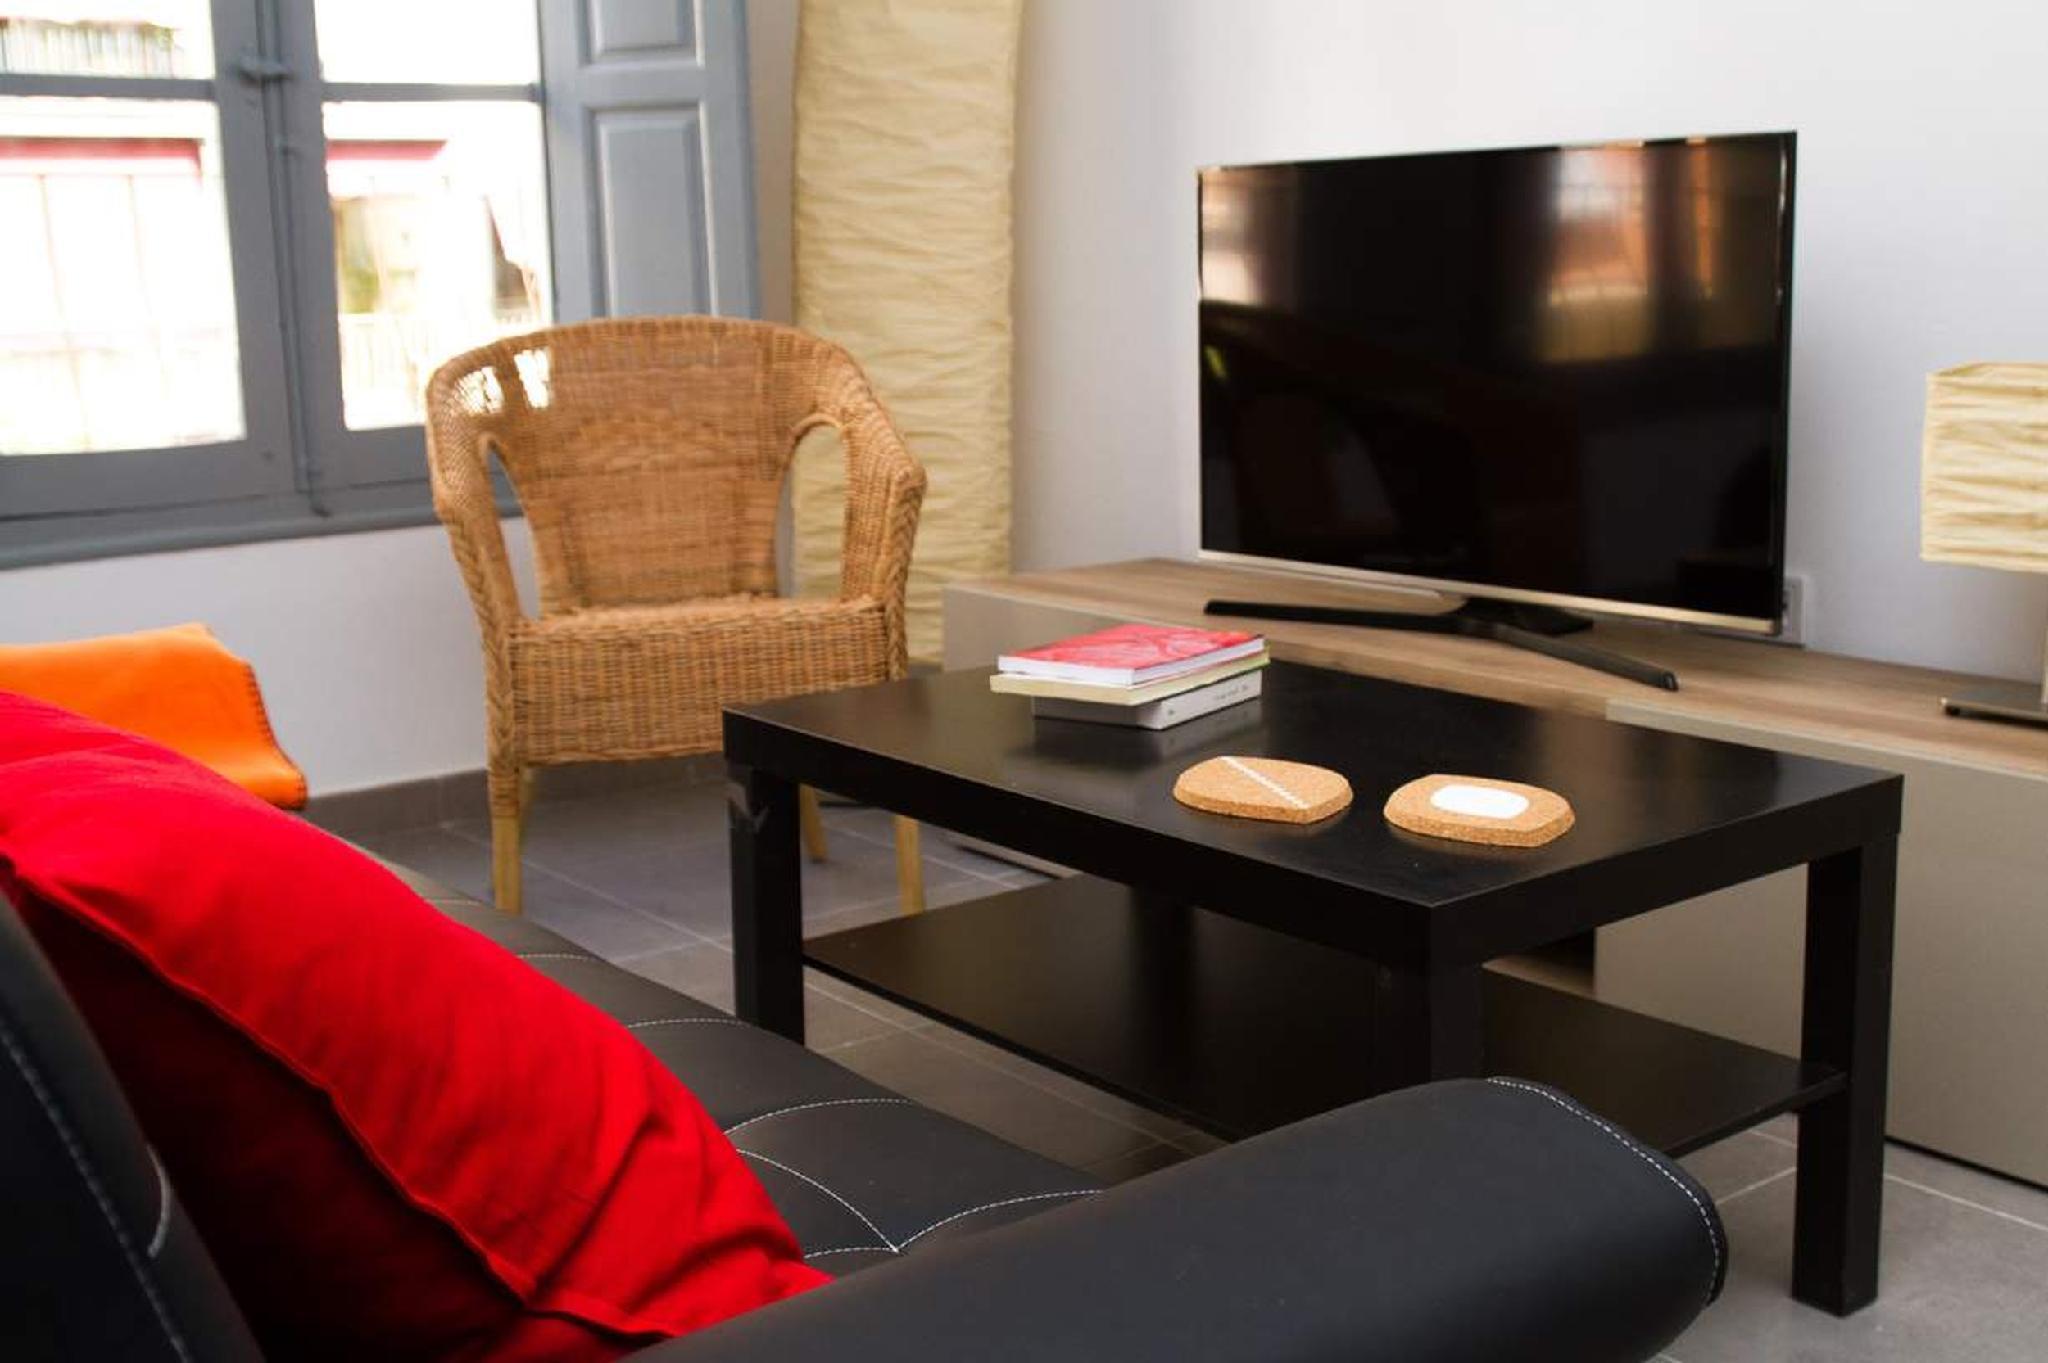 106922   Apartment In Malaga